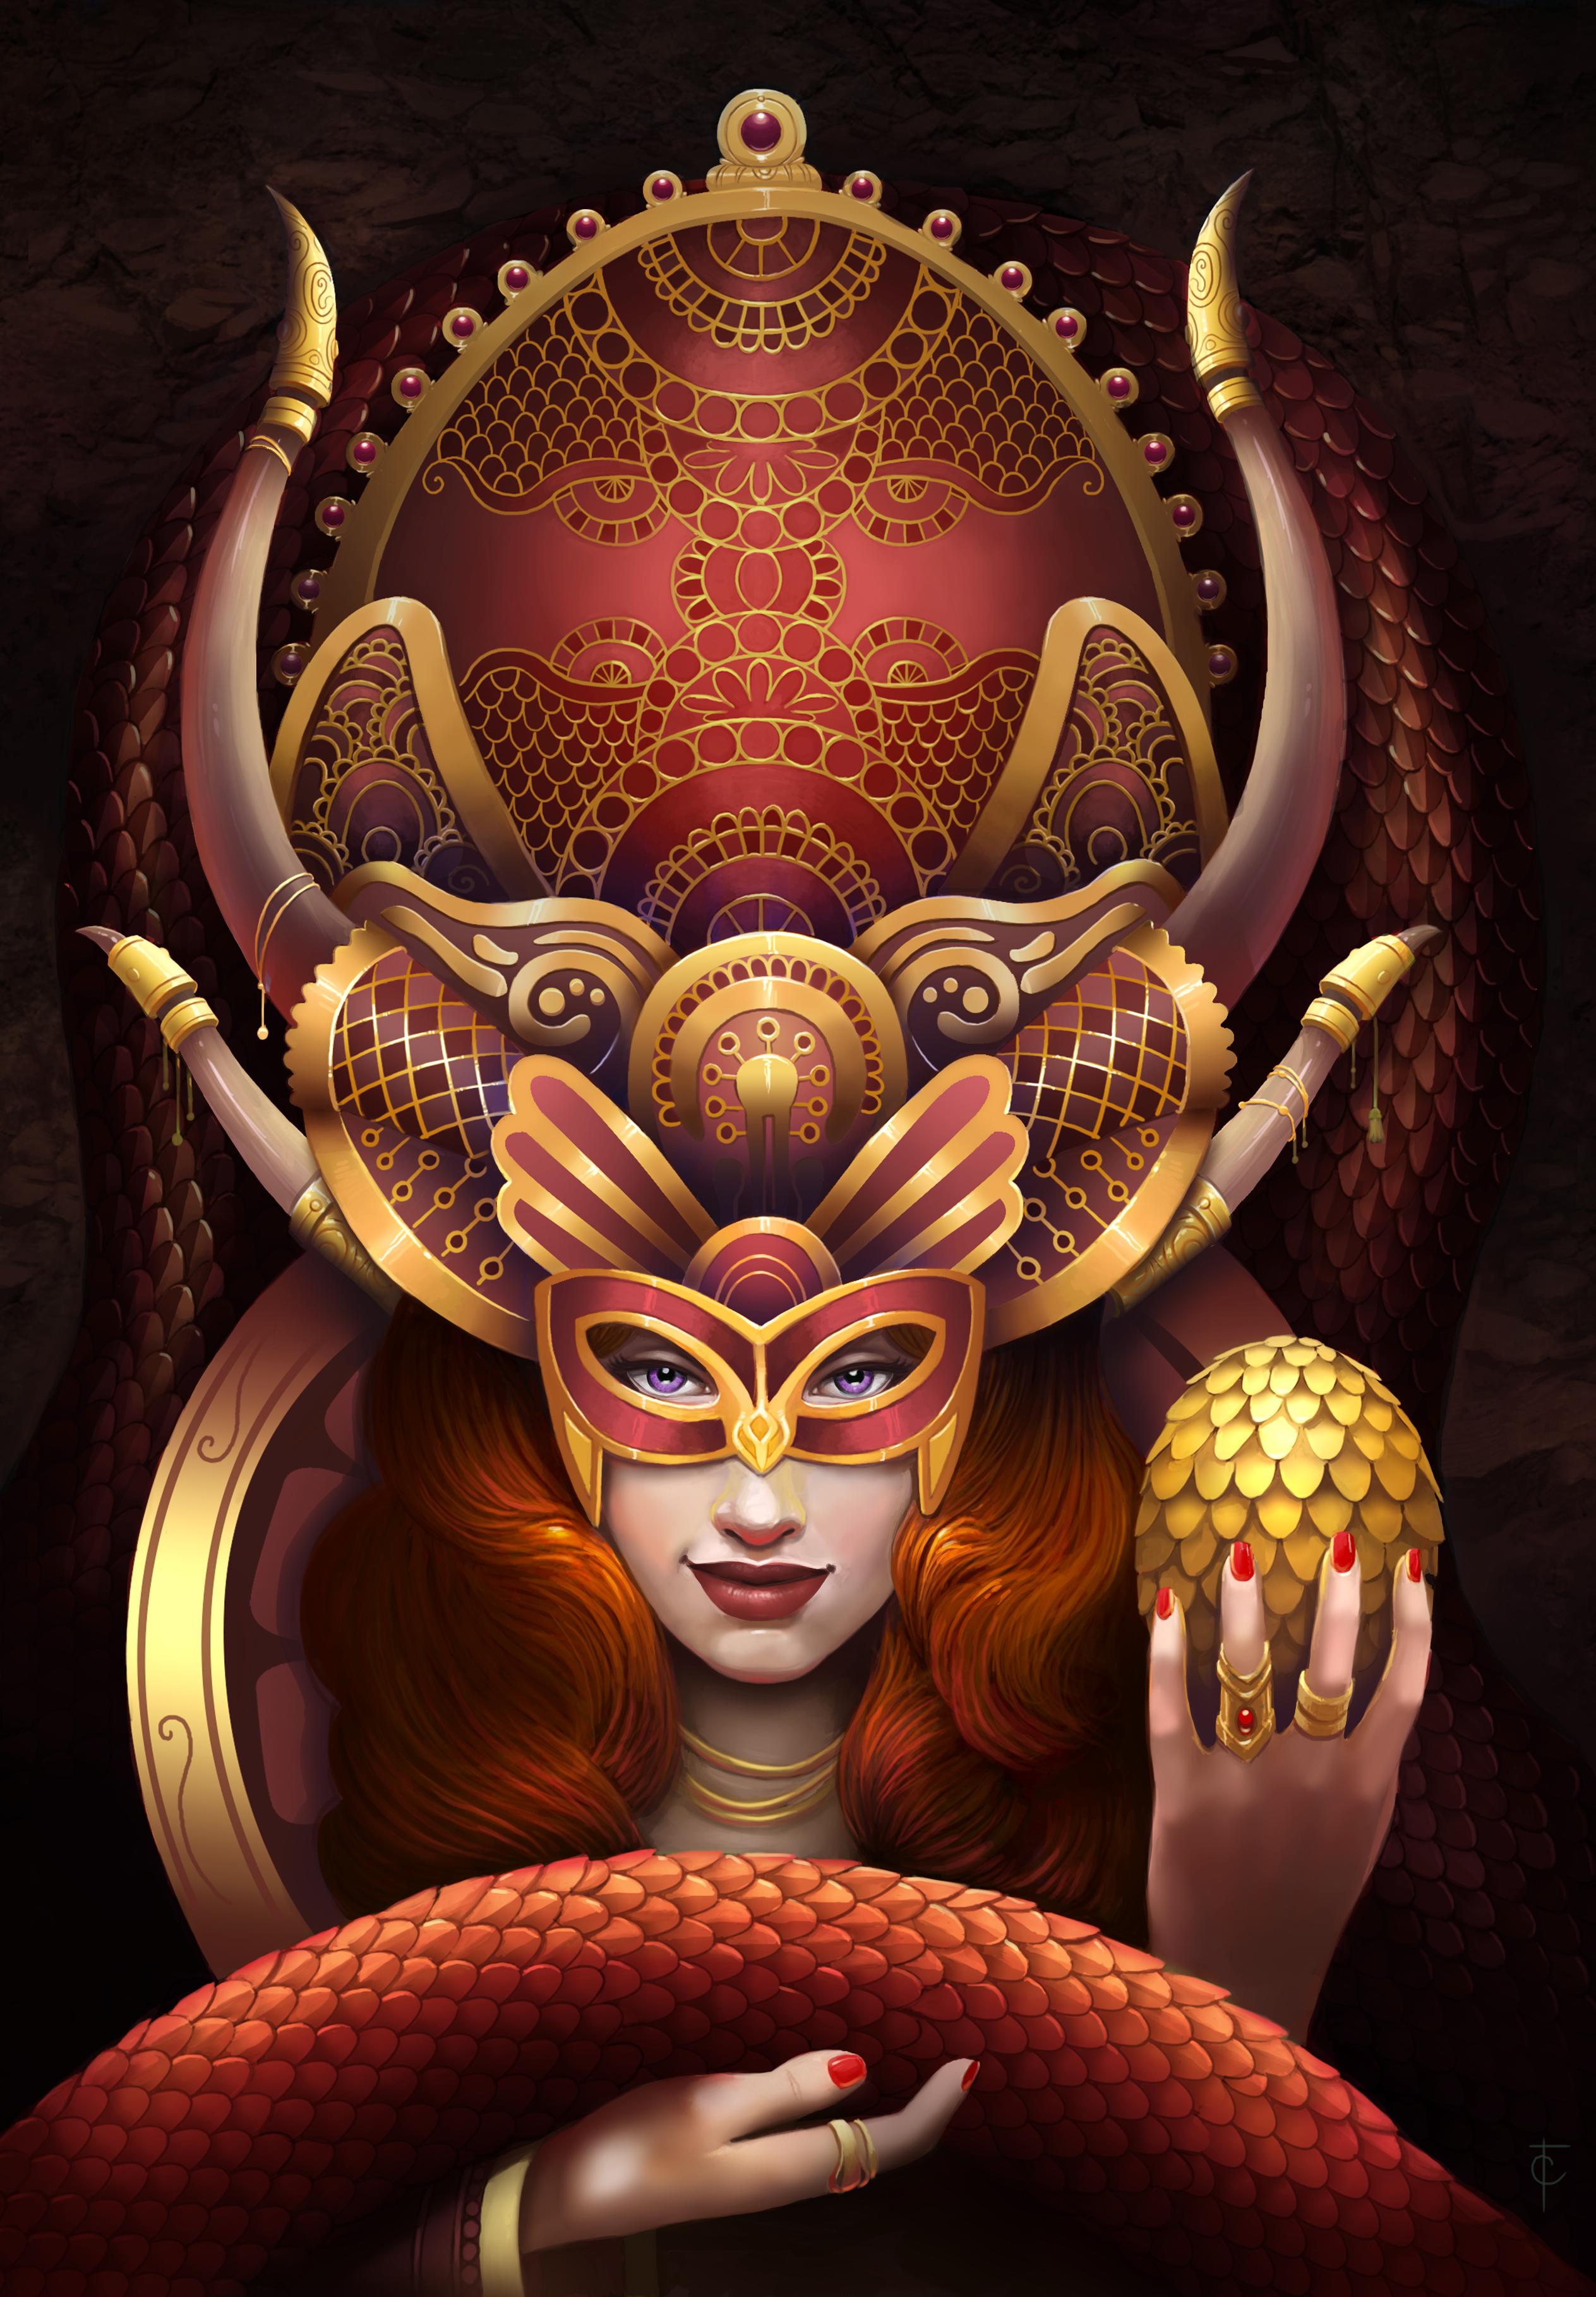 Empress by TLCook